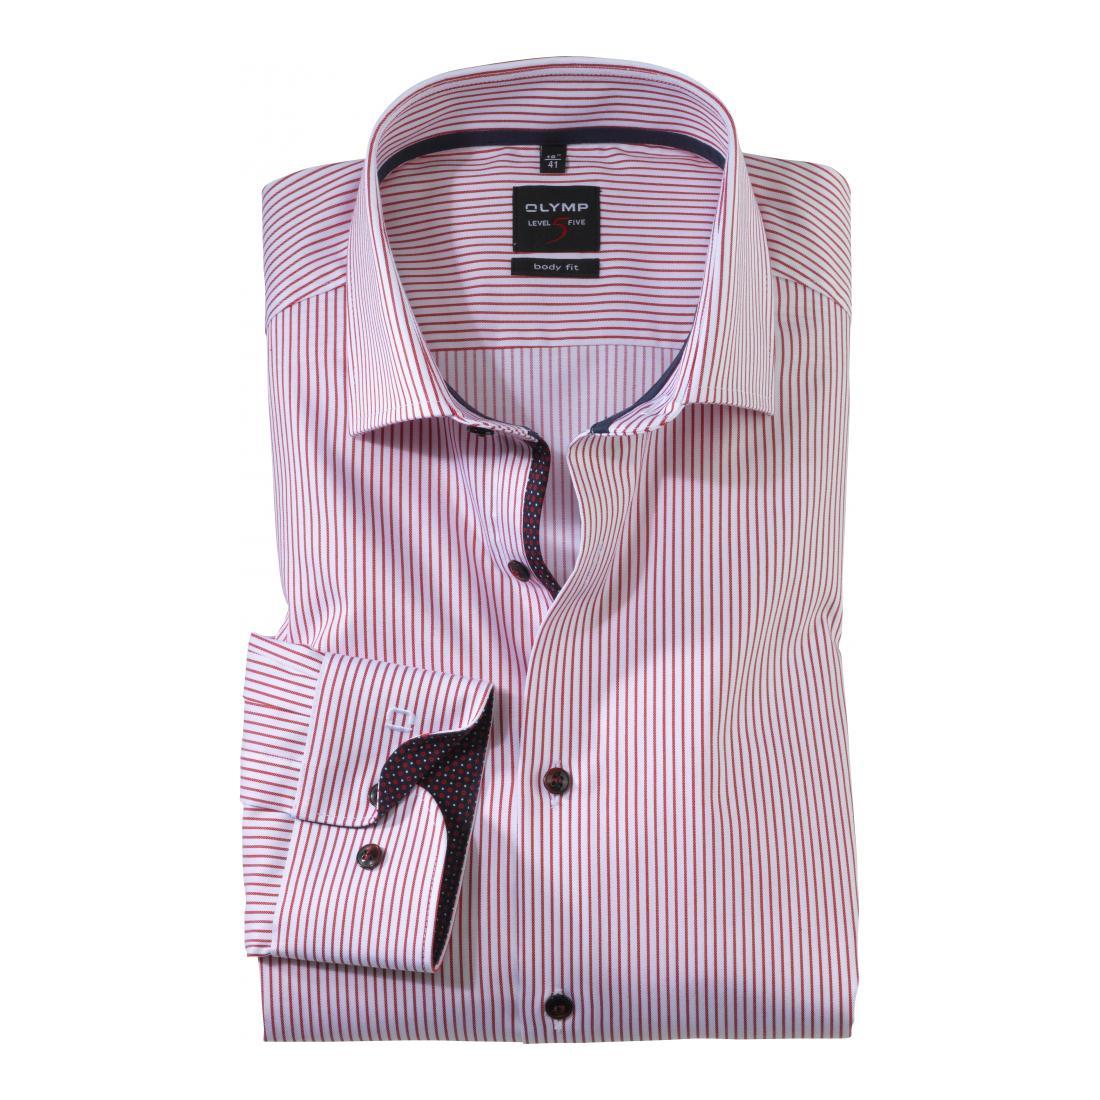 Olymp Business Hemden Herren 2092/74 Hemden